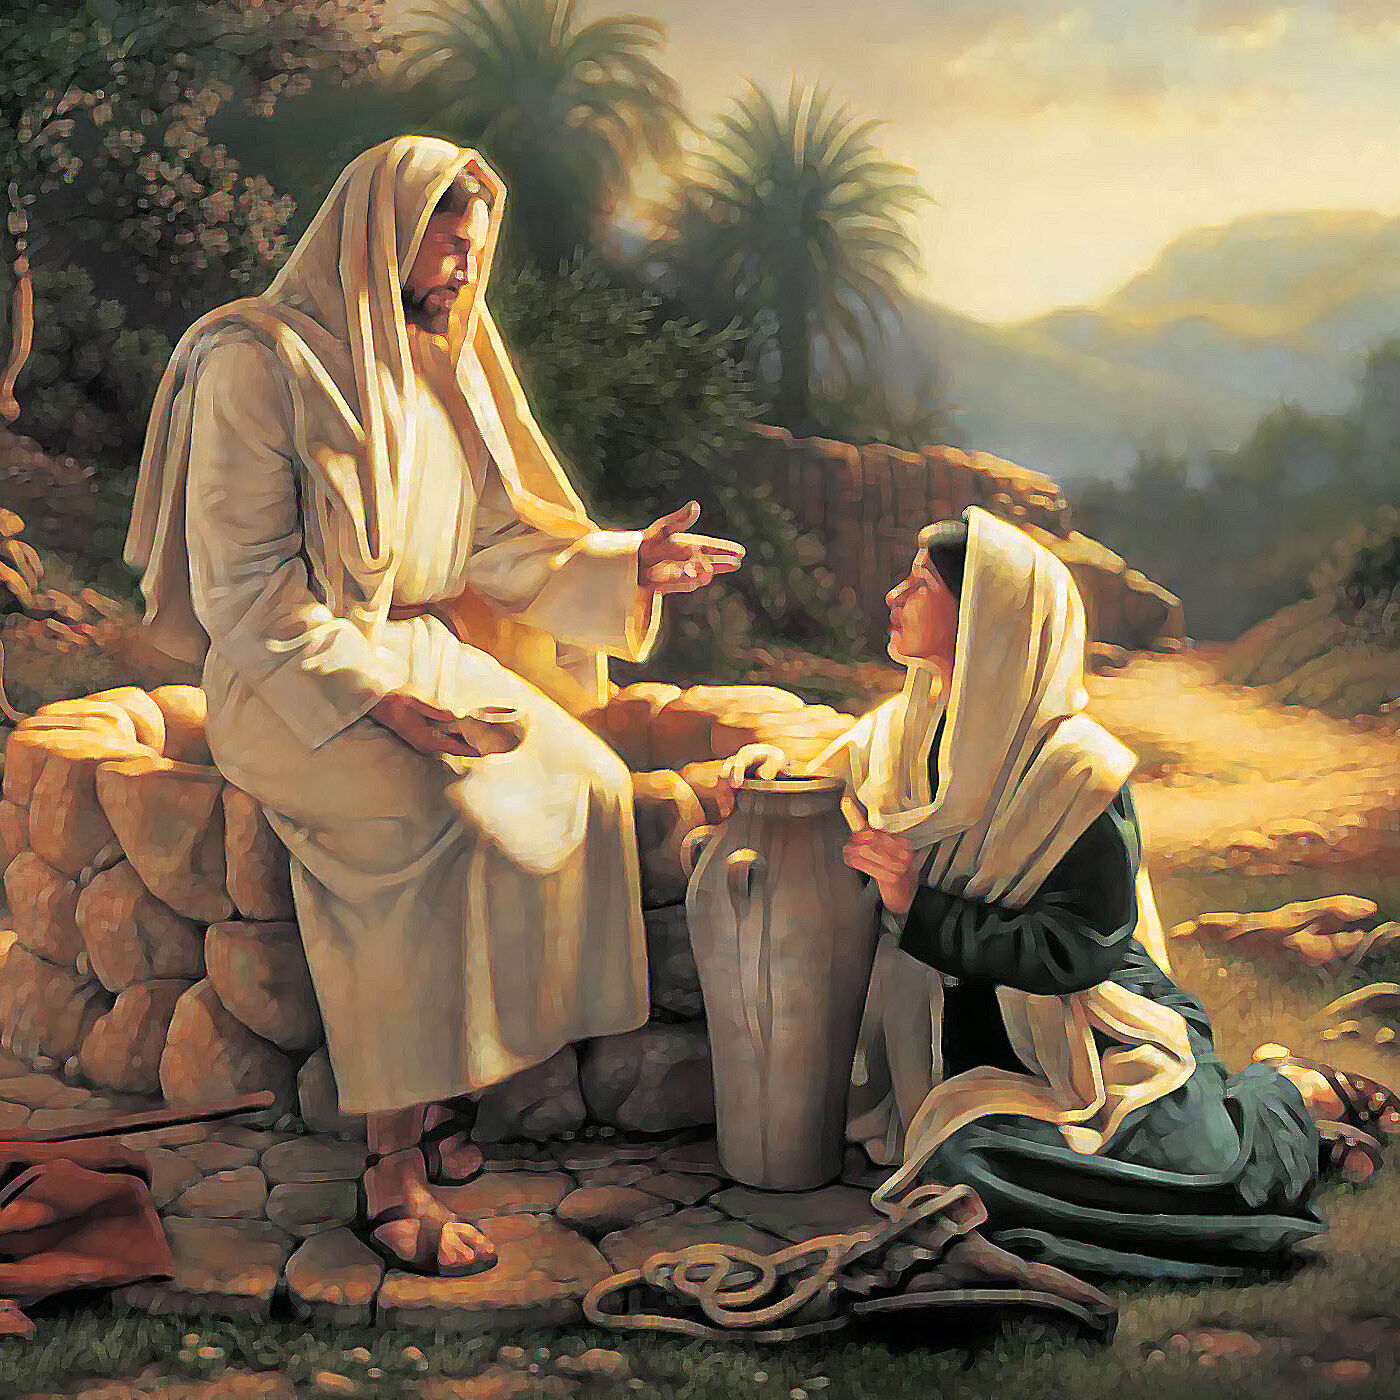 riflessioni sul Vangelo di Mercoledì 13 Ottobre 2021 (Lc 11, 42-46)